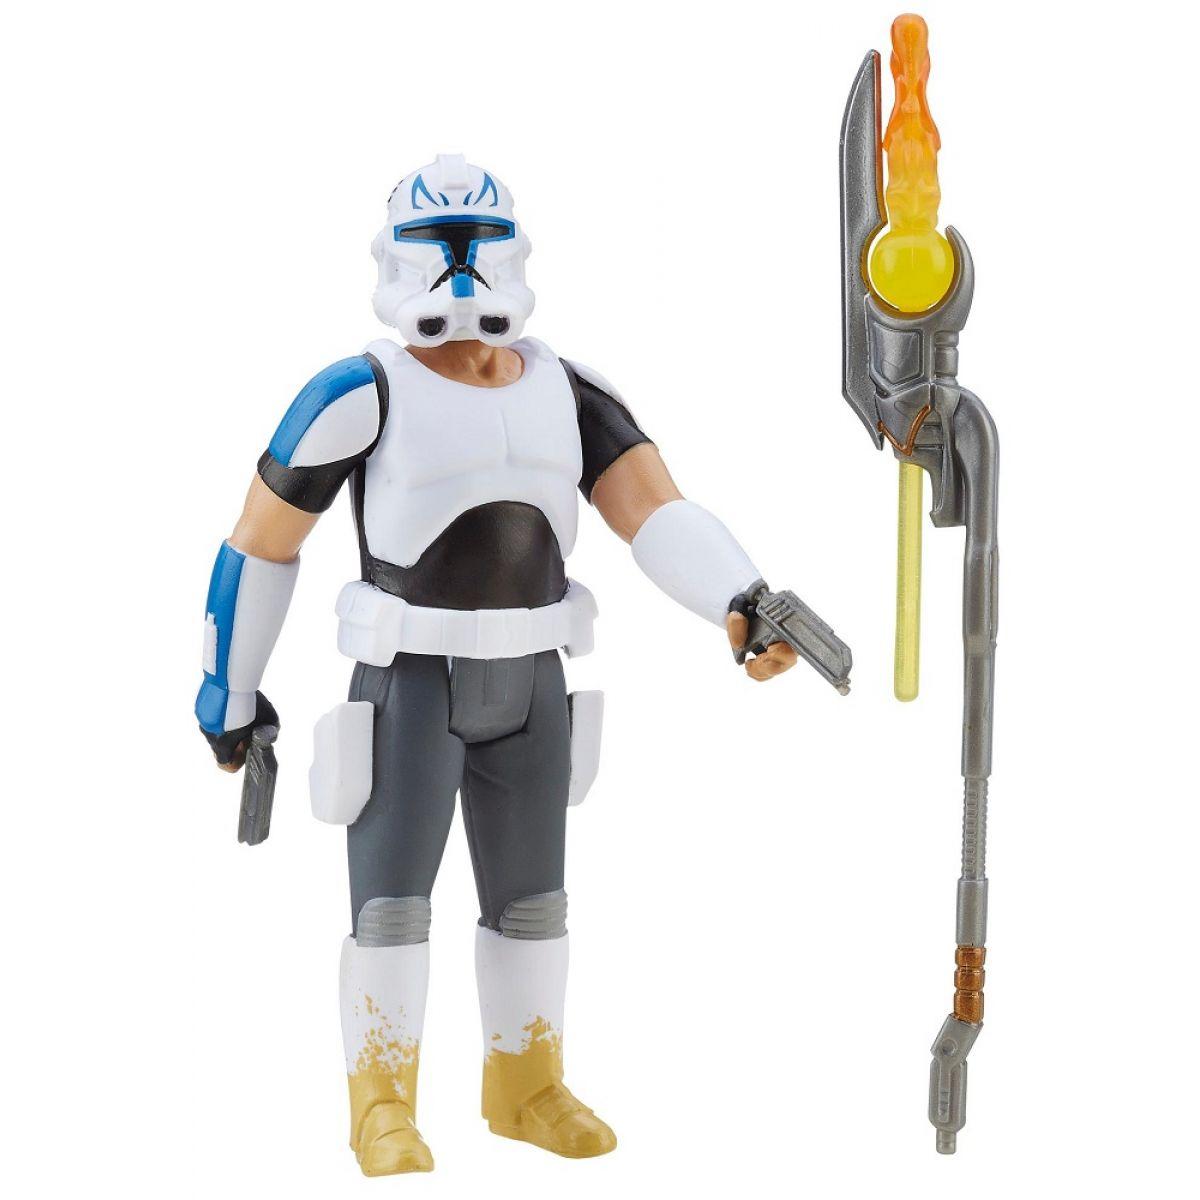 Hasbro Star Wars Epizoda 7 Sněžné figurky Captain Rex